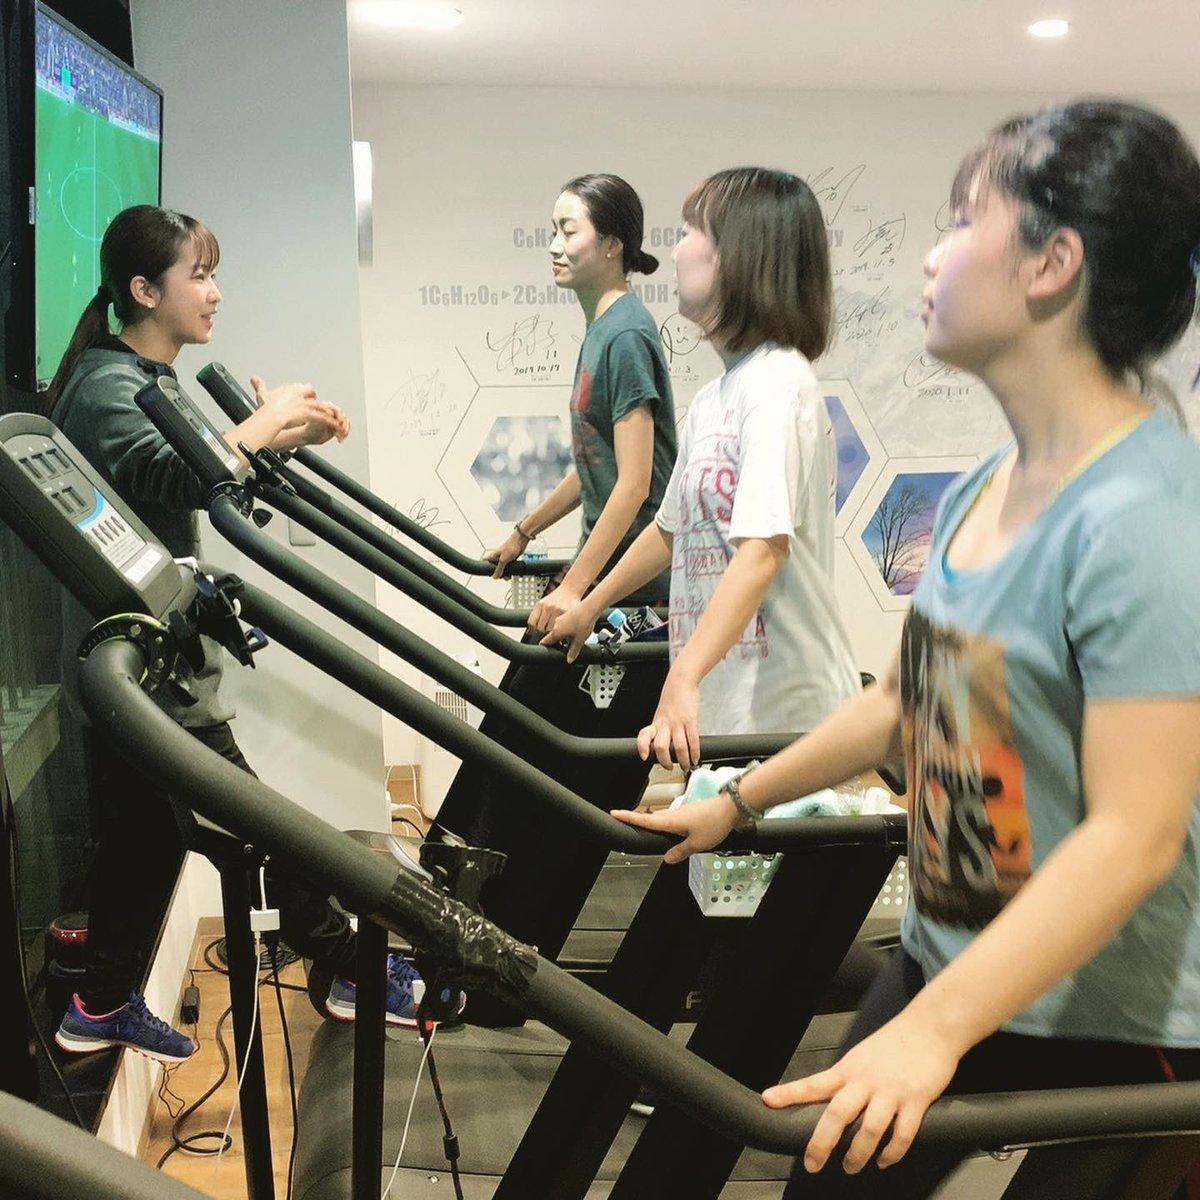 『MORE』  @MoreMag  雑誌MOREの公式ブロガーさん 柚木彩花さん しょこたうるすさん しんしんさん がハイアルチ吉祥寺スタジオへ 体験に来てくれました! @highalti___k   30分歩くだけで2時間分の効果に感動してくれました(^^)  https://more.hpplus.jp/morehapi/article/yuzu/e-news/53939…  #高地トレーニング #無料体験 #ハイアルチpic.twitter.com/x5xNAtFSDc – at 吉祥寺駅 (Kichijōji Sta.)